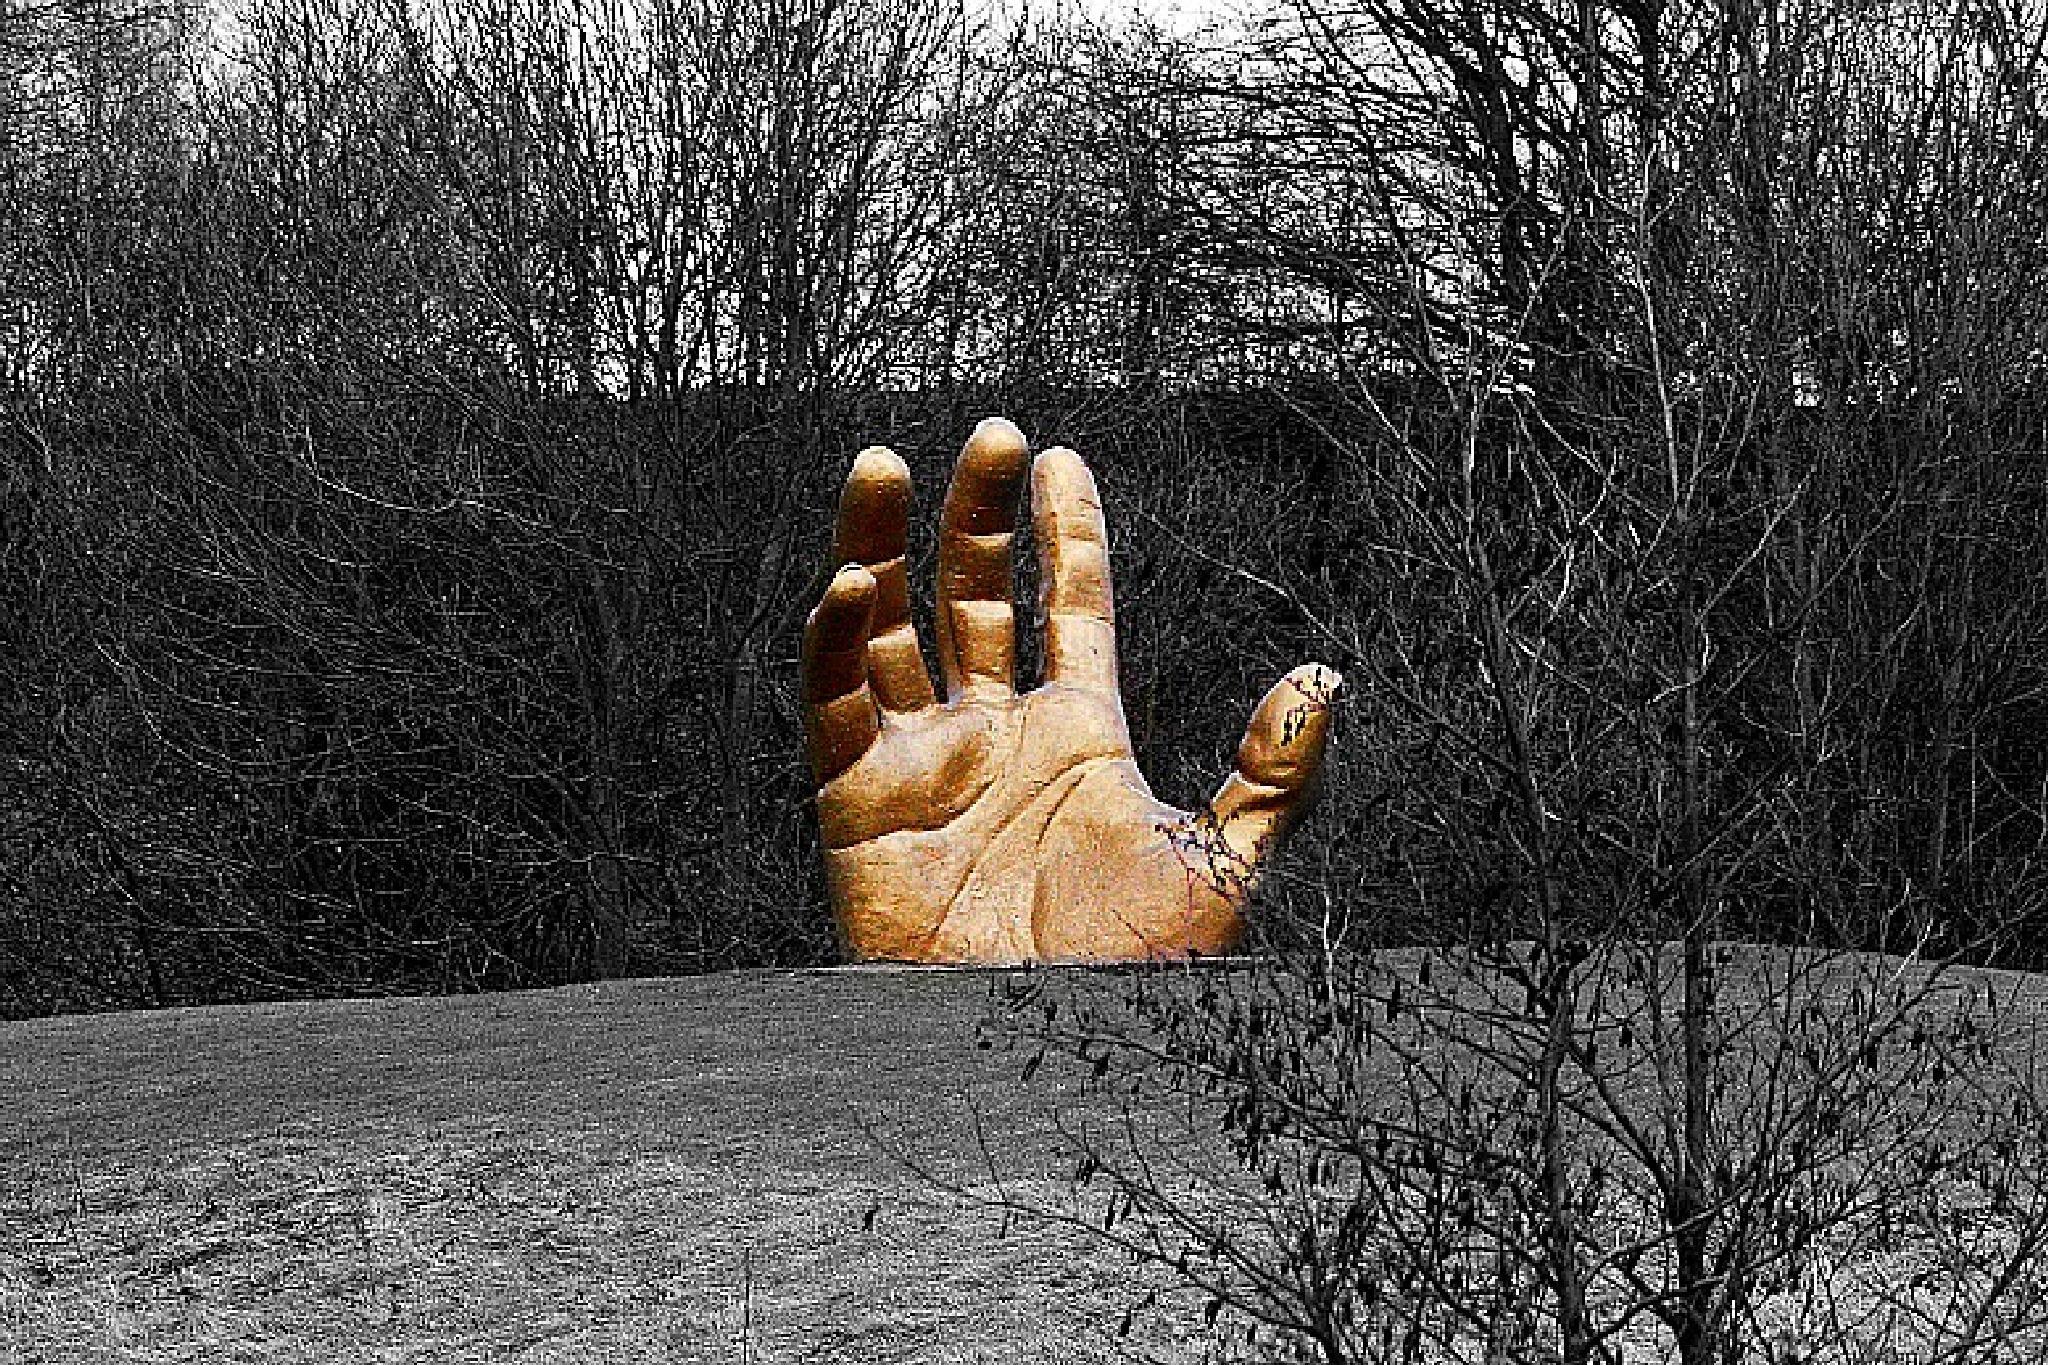 Golden handshake  by keve E